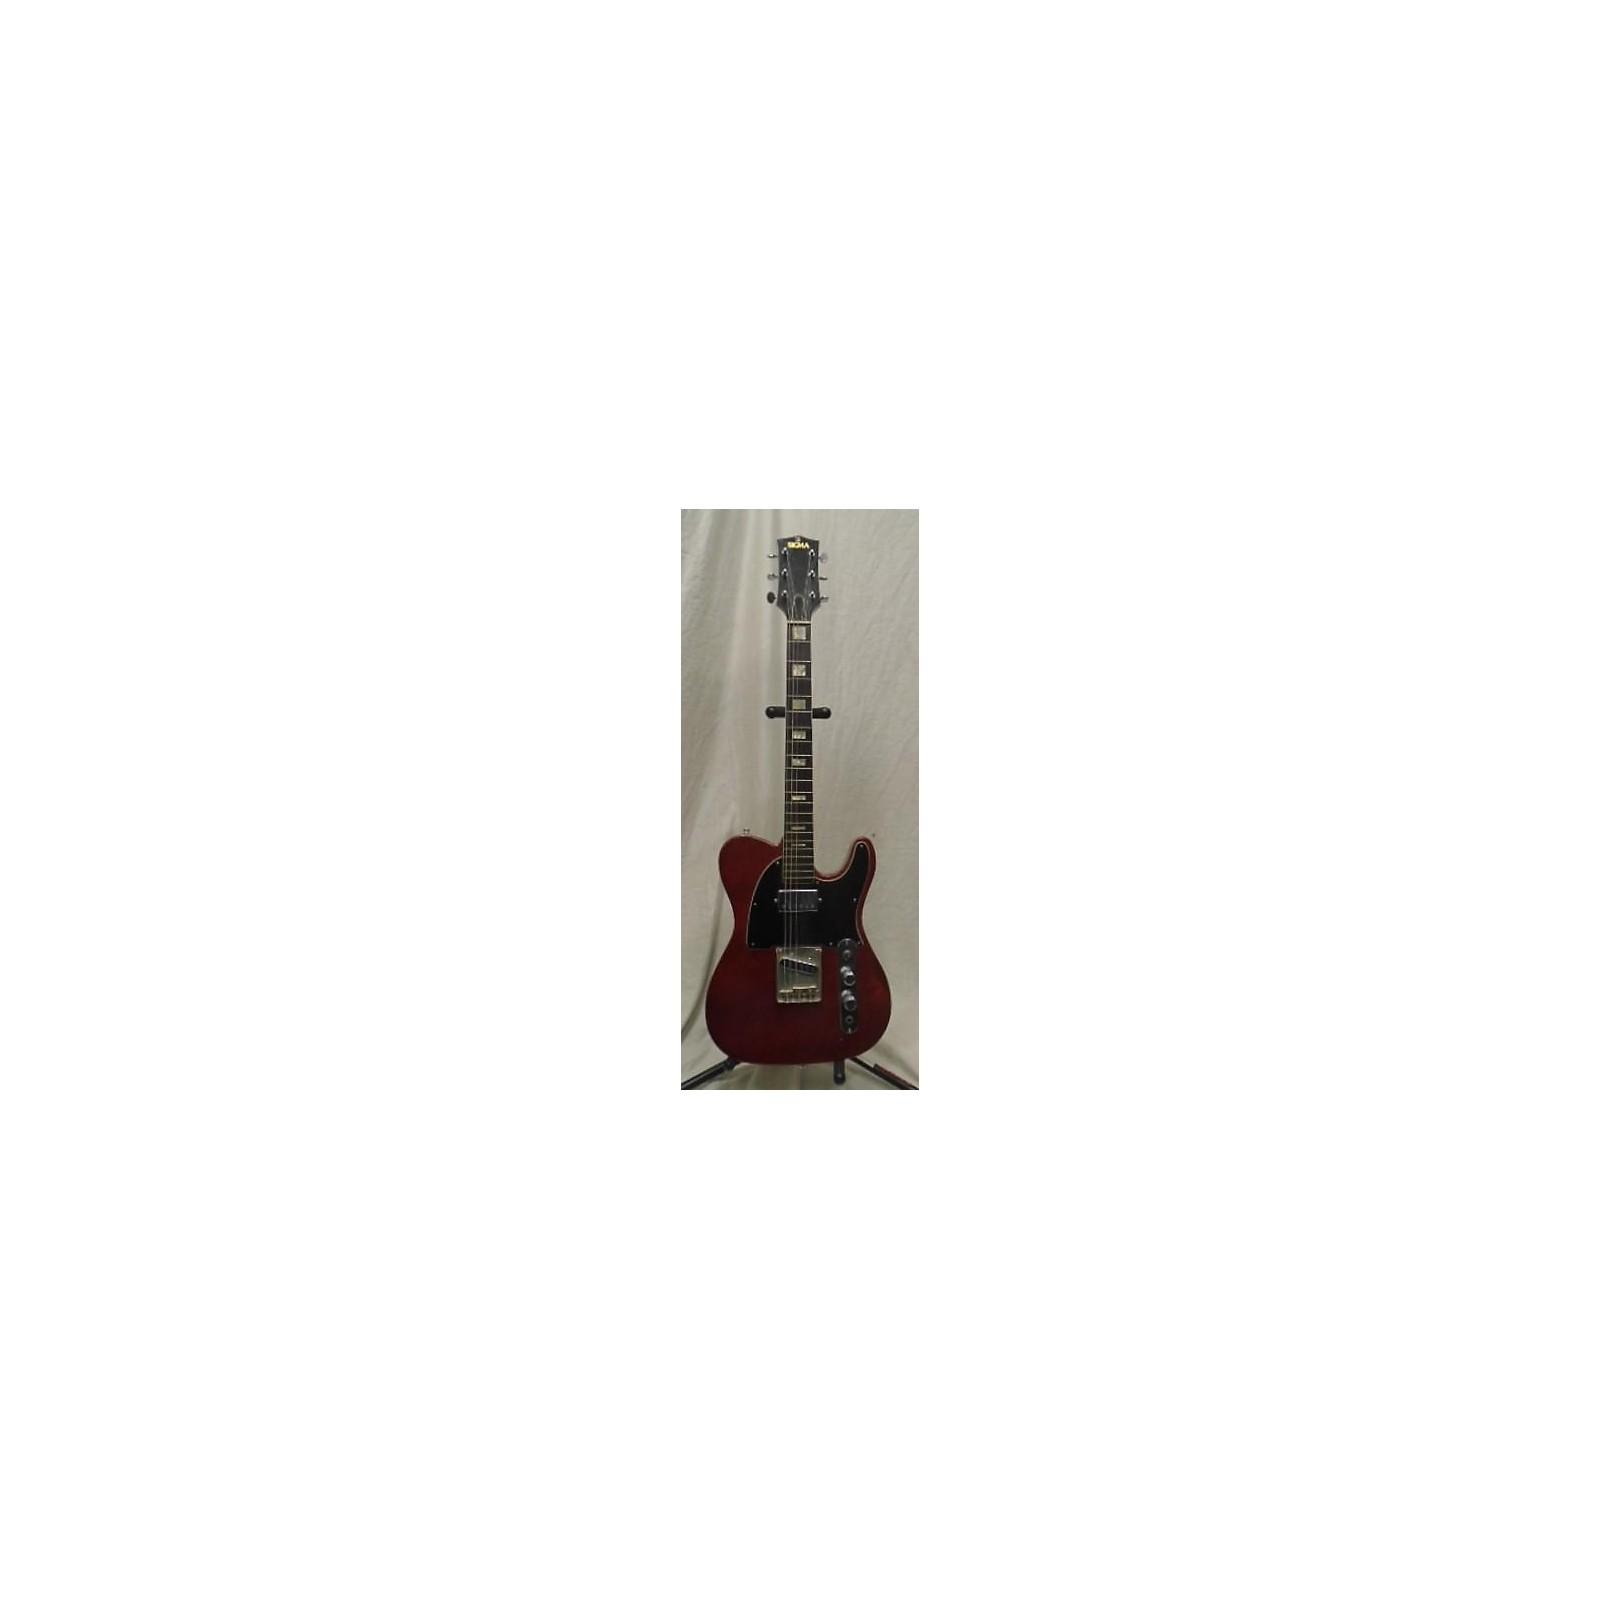 SIGMA SBF2-6 Solid Body Electric Guitar